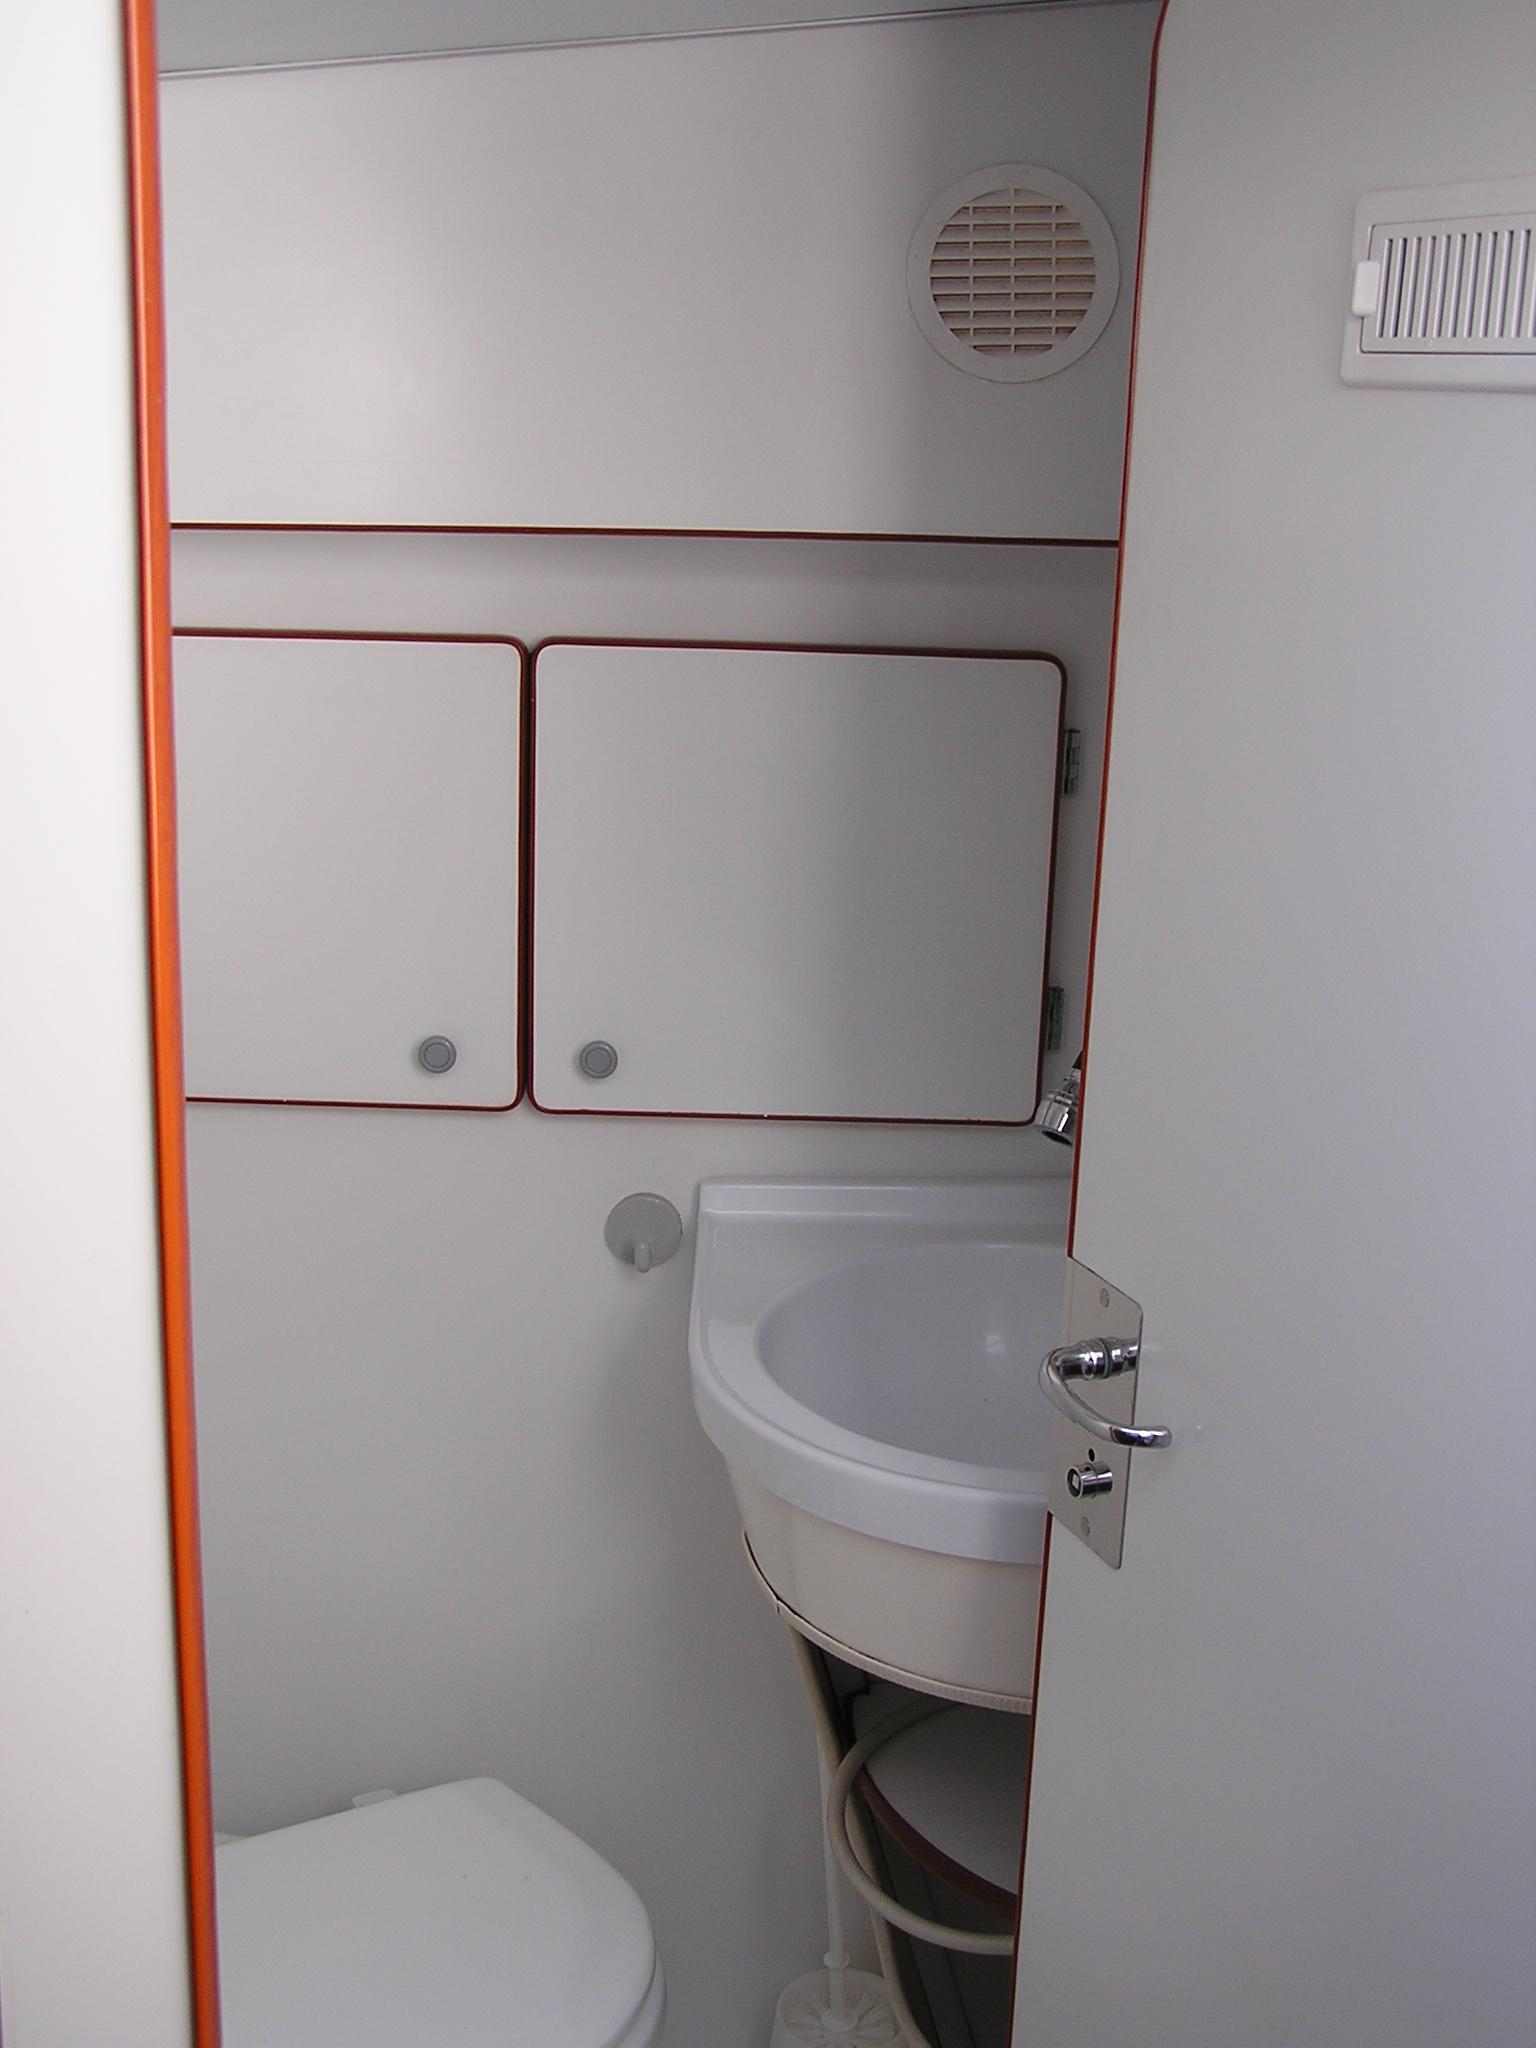 Nicols SEDAN 800 salle d eau sireuil charente intercroisieres